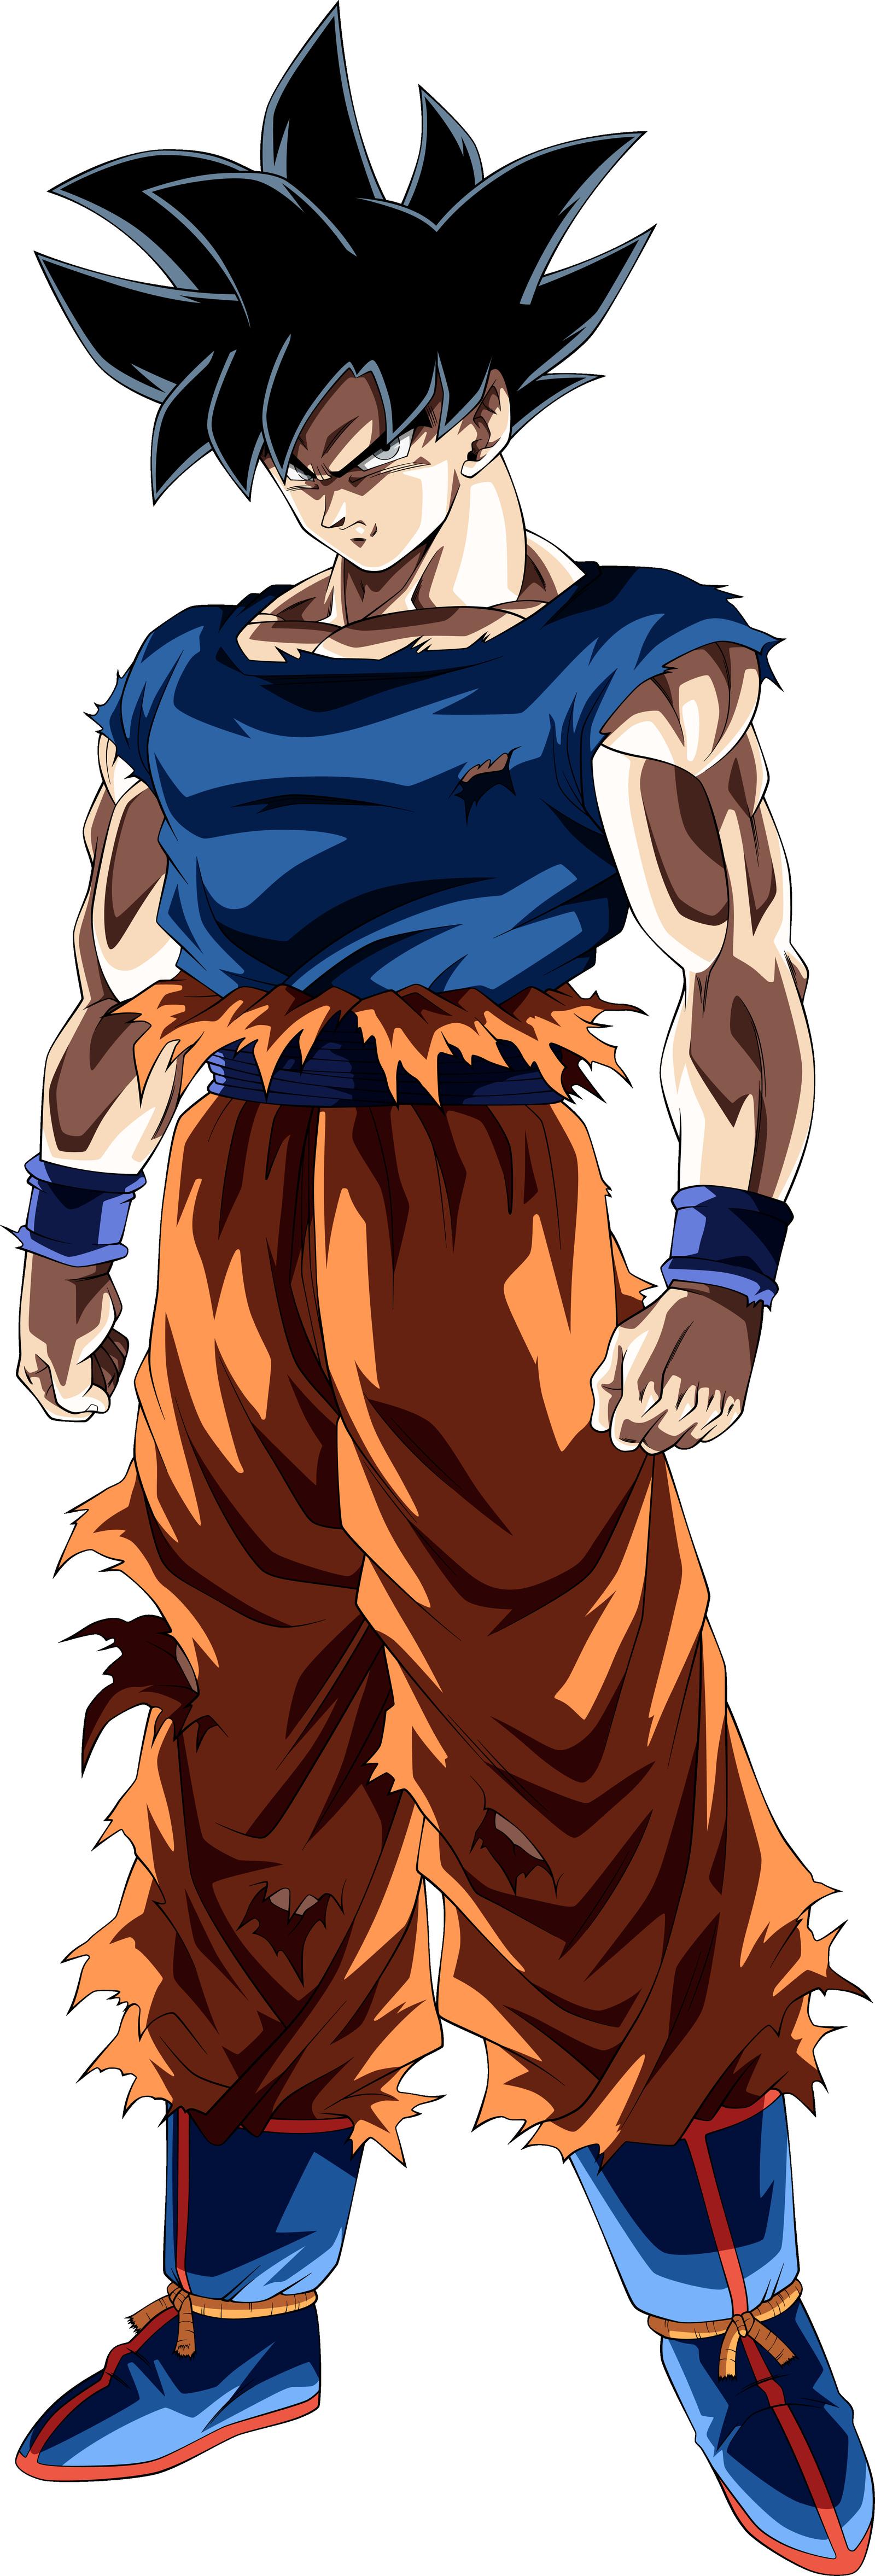 Goku Ultra Instinct Sign By Thetabbyneko On Deviantart